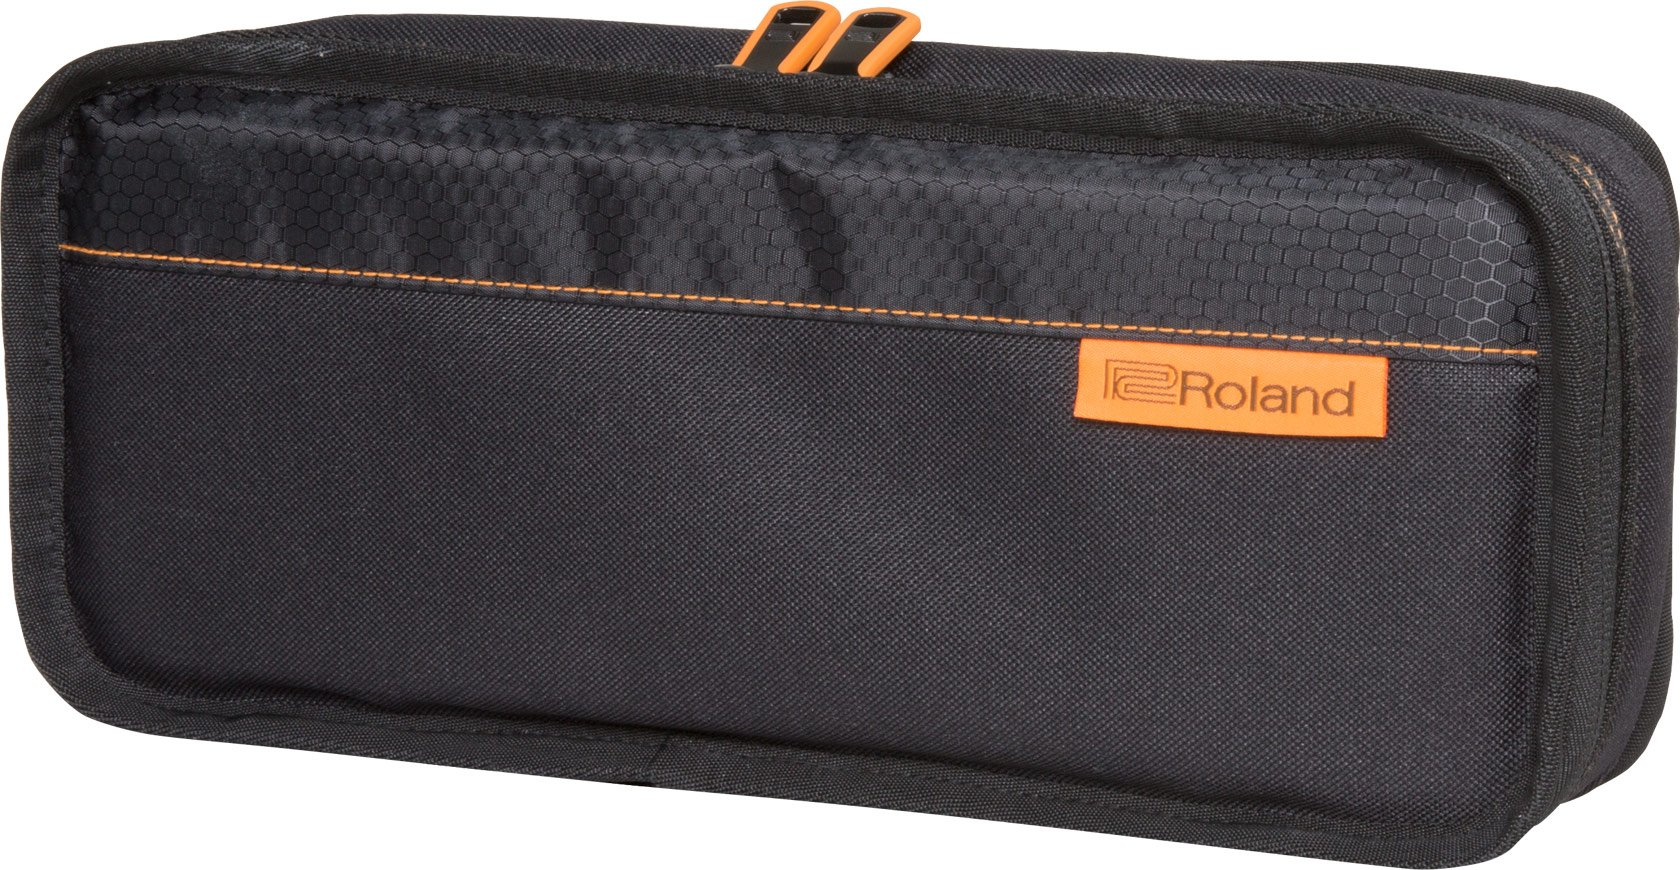 Carrying Bag for V-1HD or V-1SDI Switchers